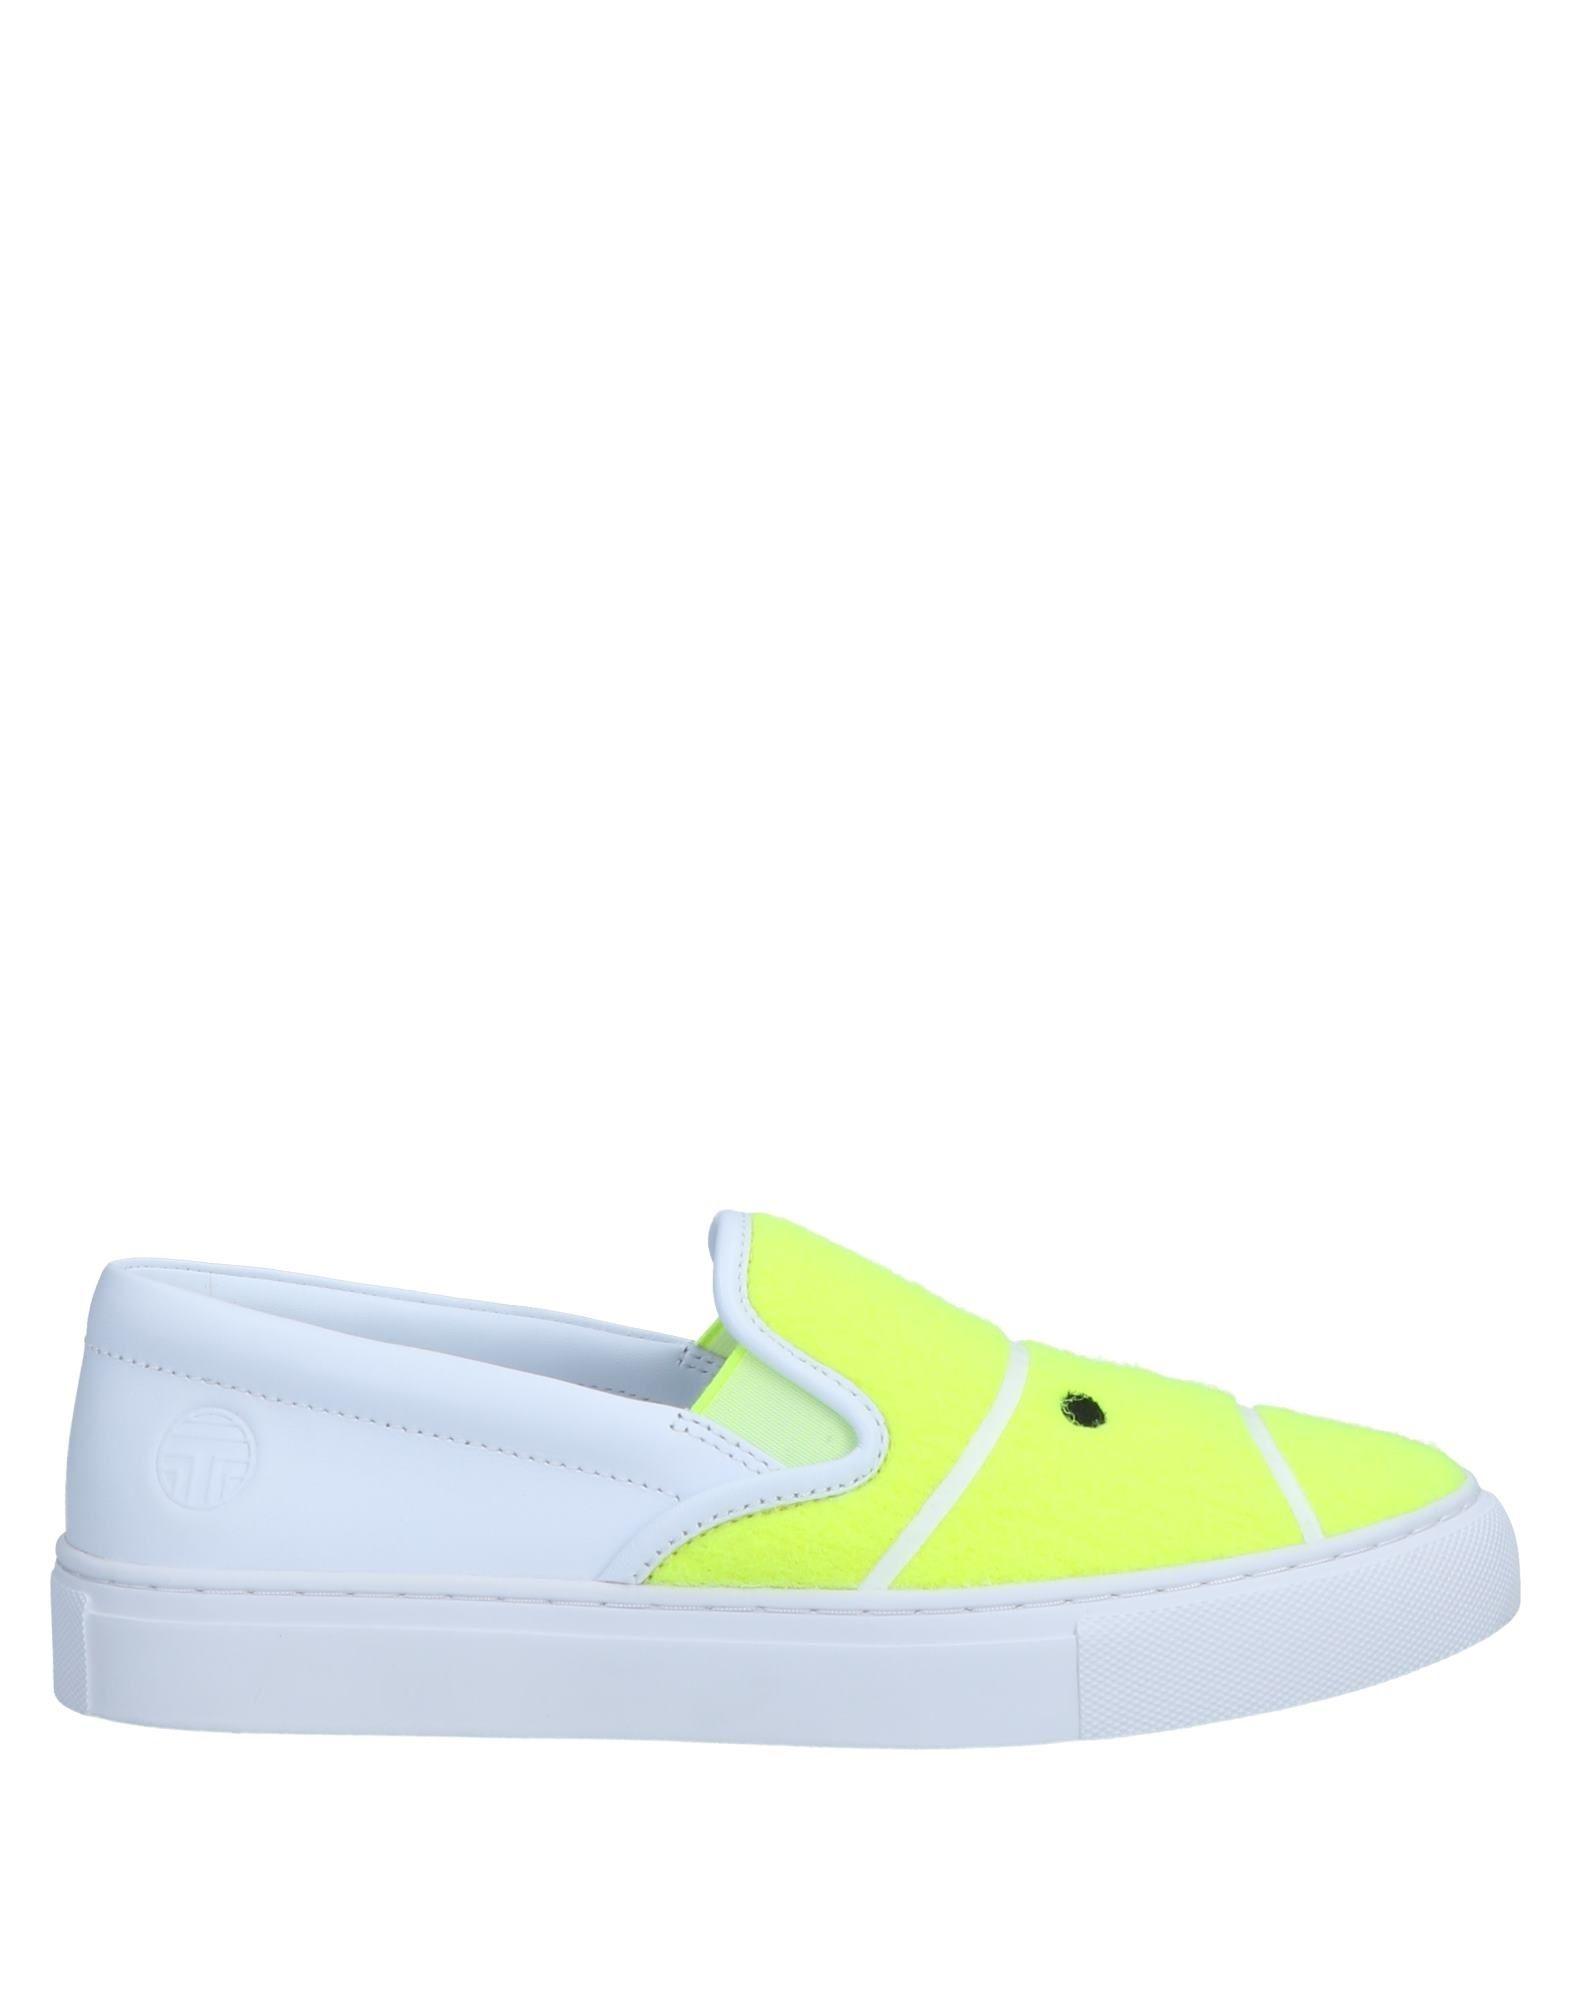 Tory Sport Sneakers - Women Tory Sport Sneakers Sneakers Sneakers online on  United Kingdom - 11575332IA c3b0f6